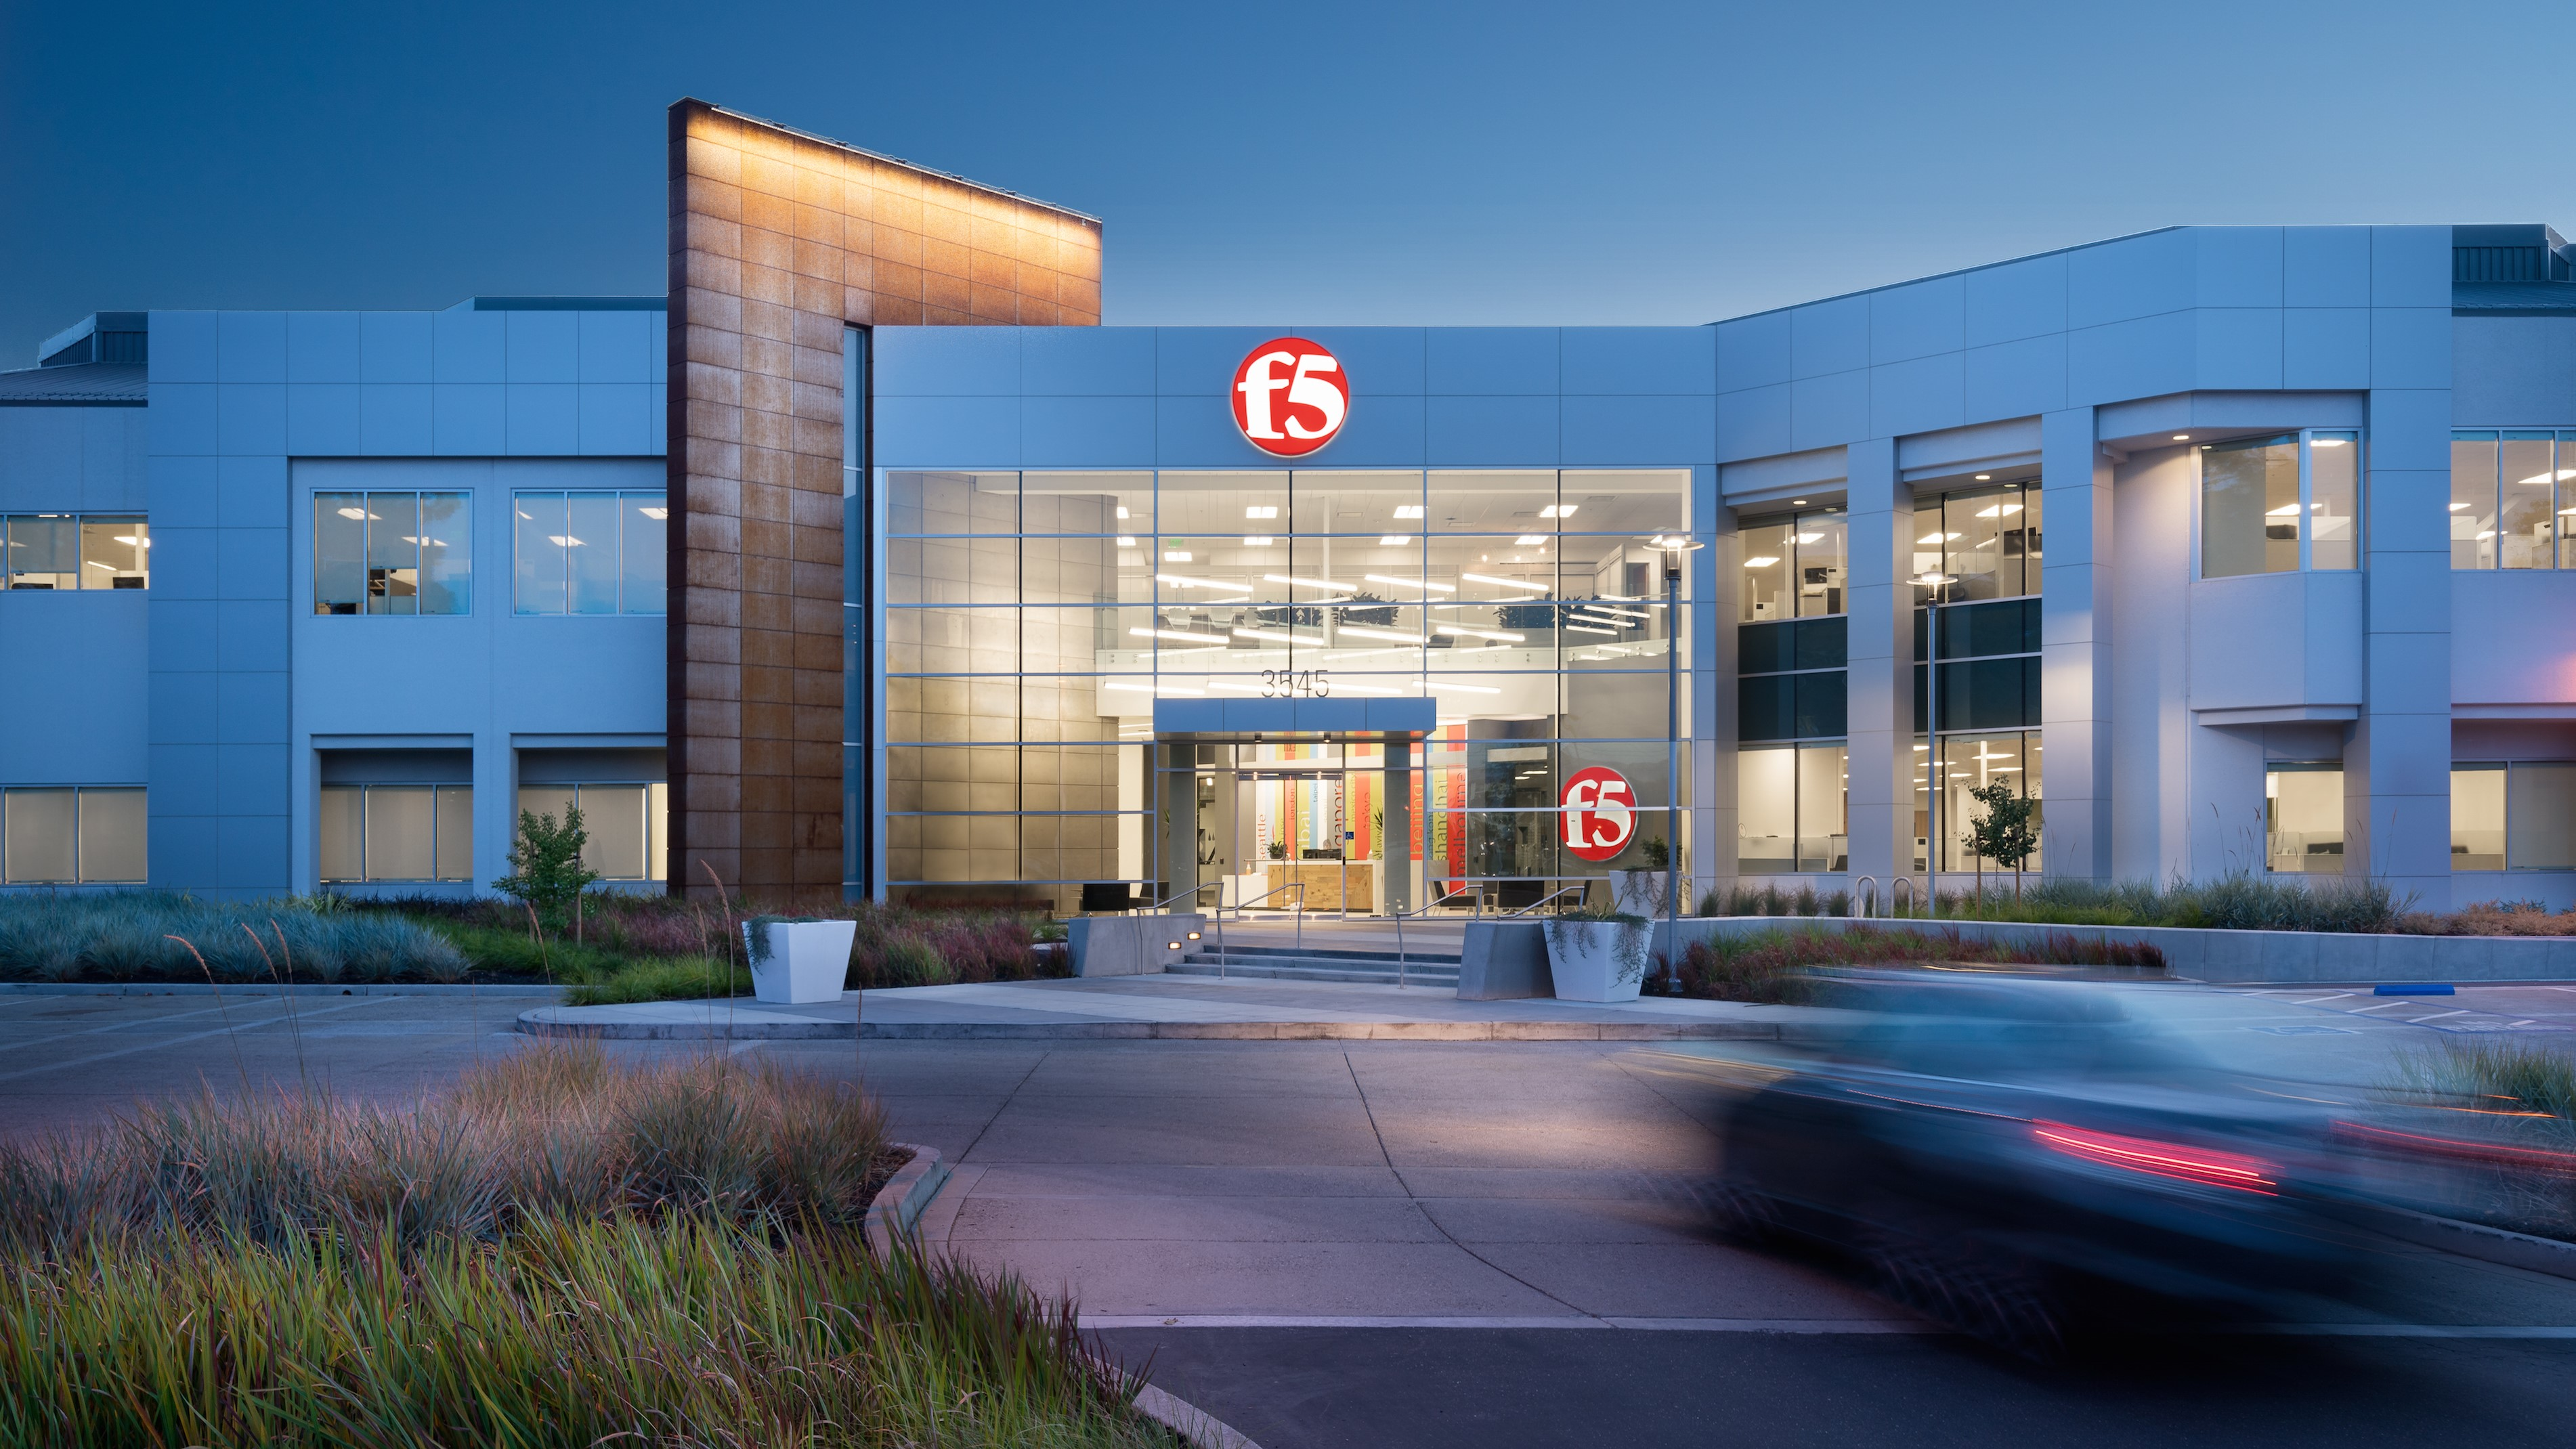 ▷ F5 Networks ha adquirido Nginx por $ 670 millones. 1